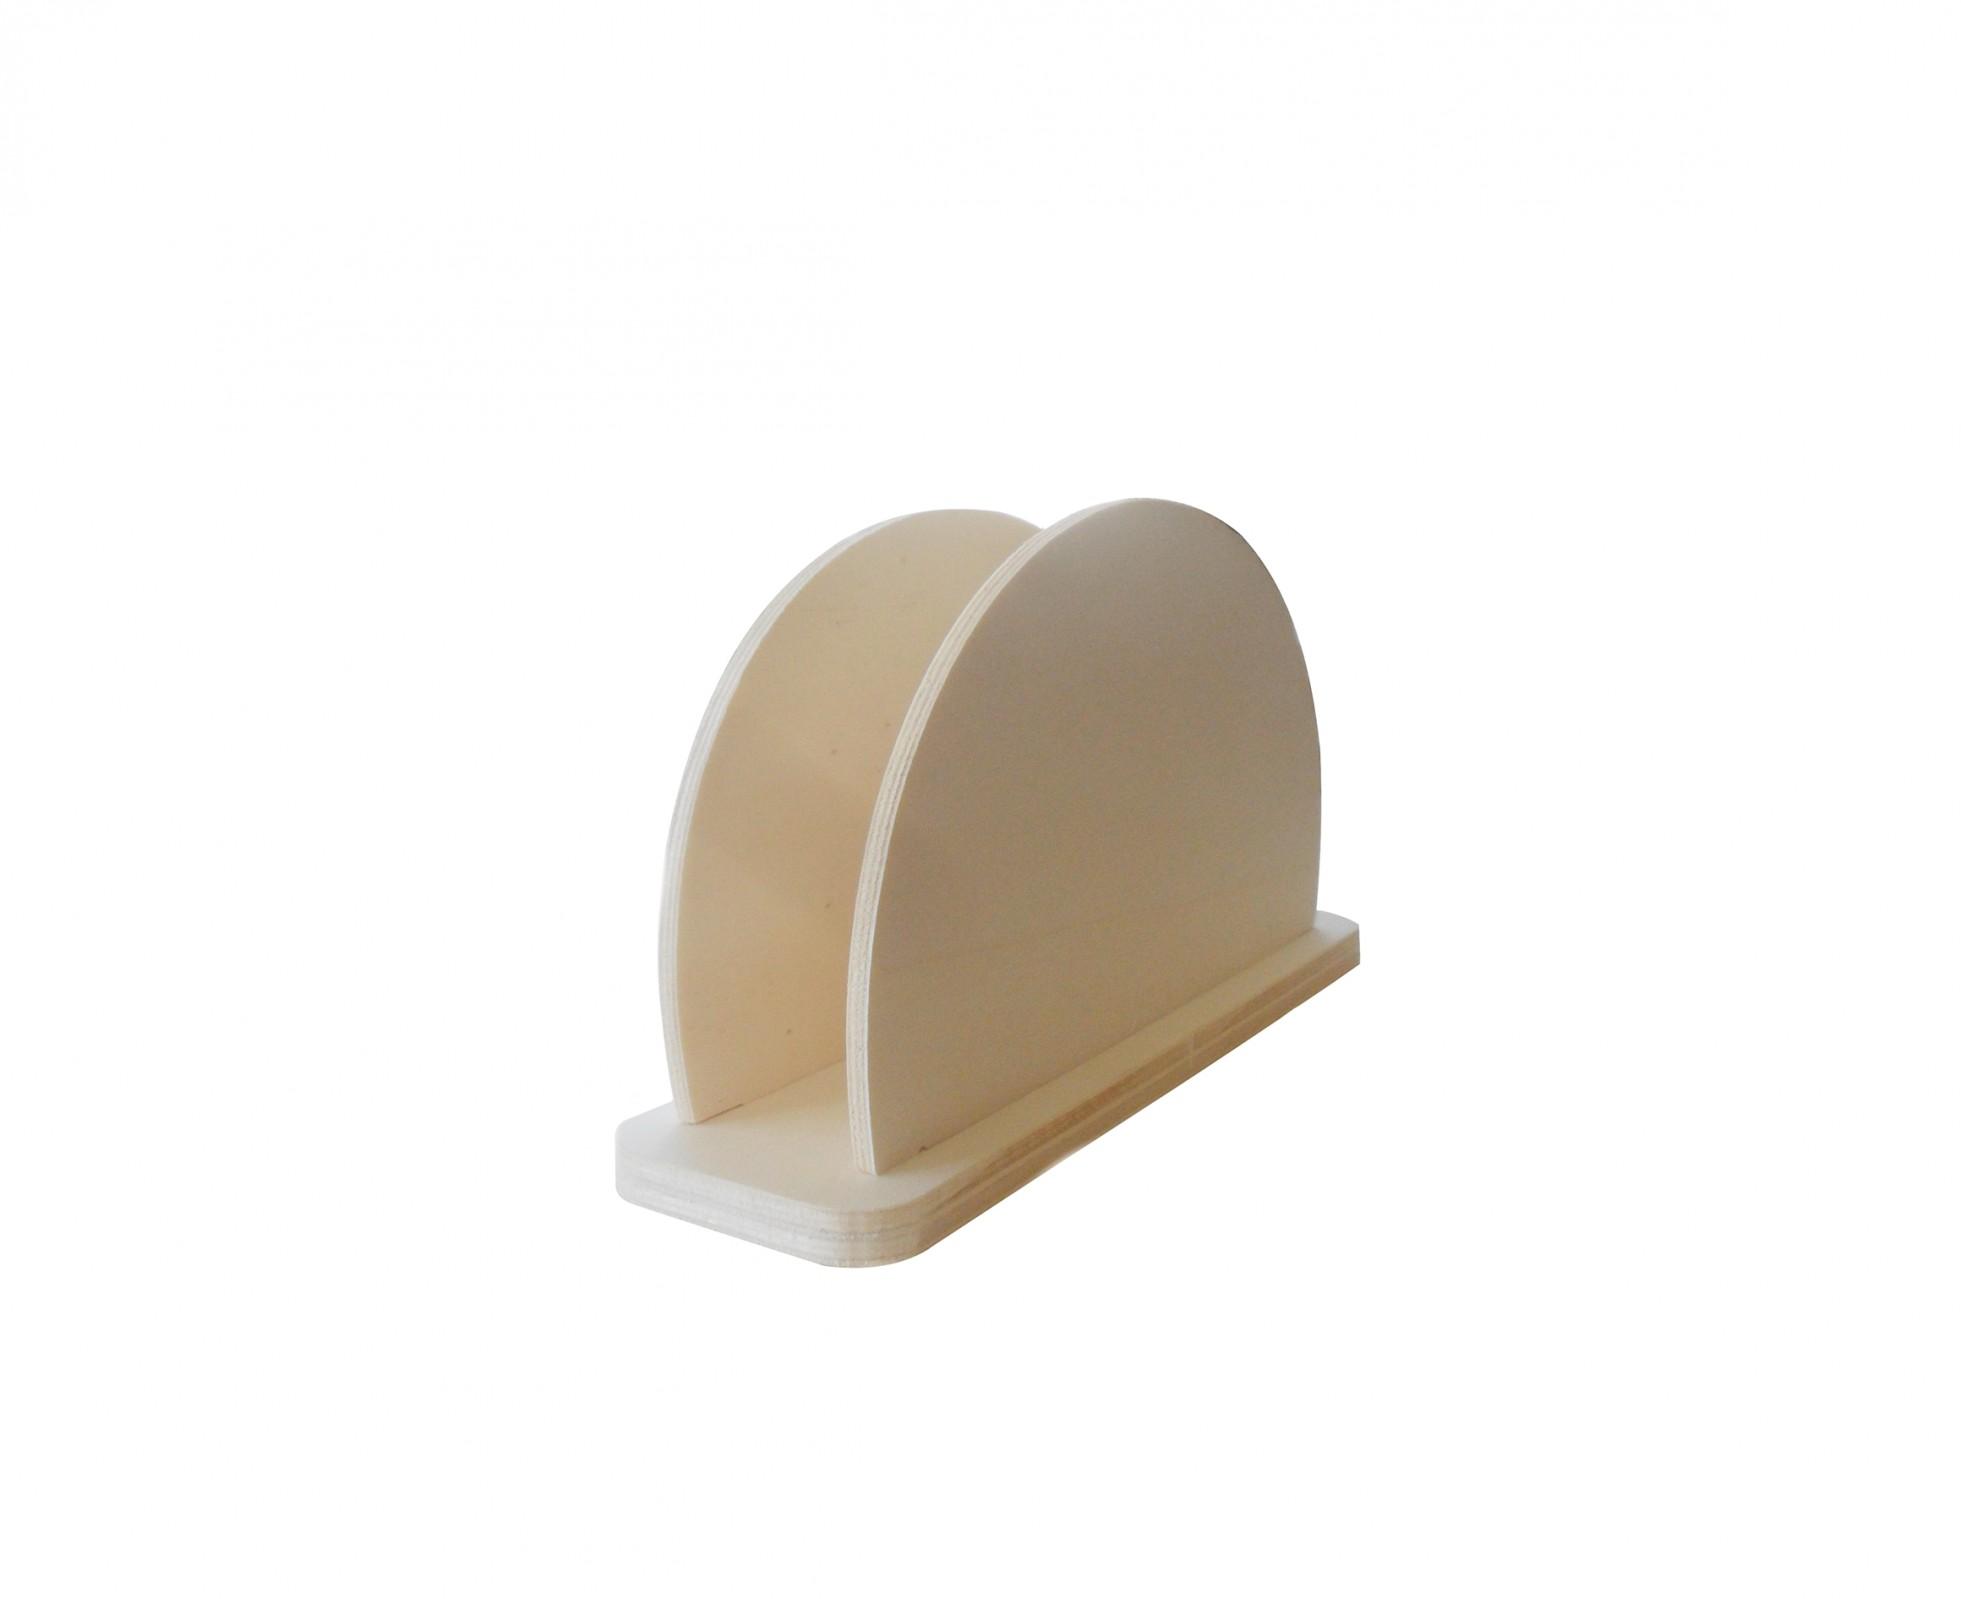 Vassoio Vasca Da Bagno : Piccola vasca da bagno tuffati nel piccolo bagno mynamewasgod